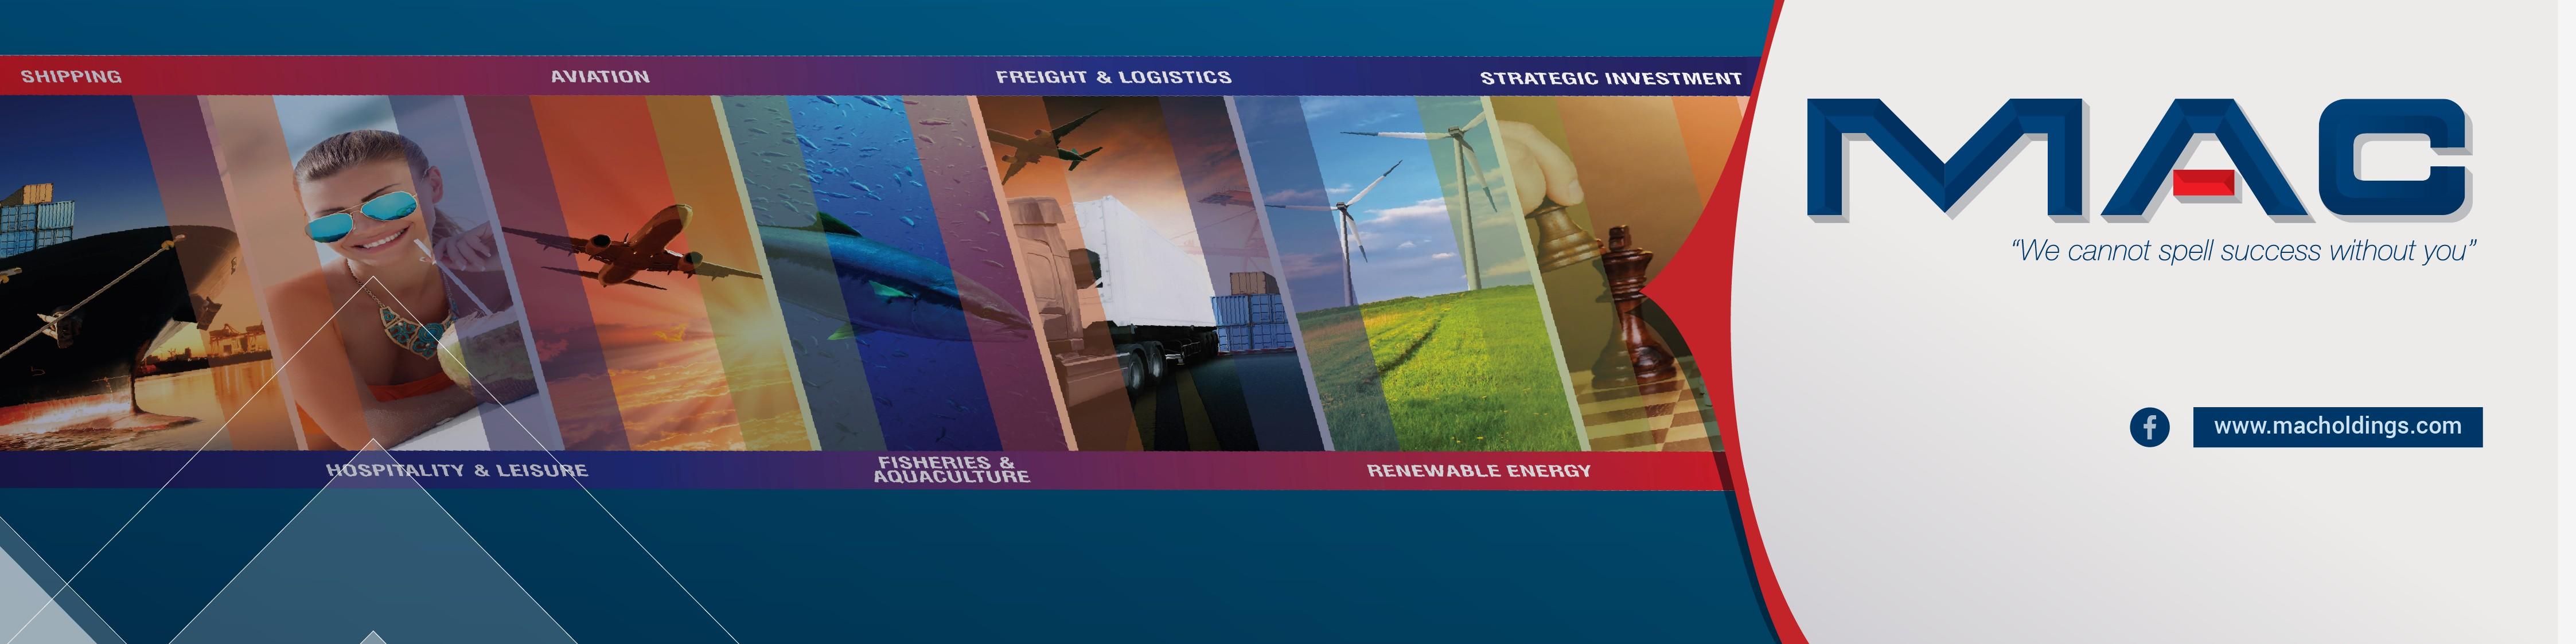 Ags Logistics Pvt Ltd mac holdings (private) limited | linkedin